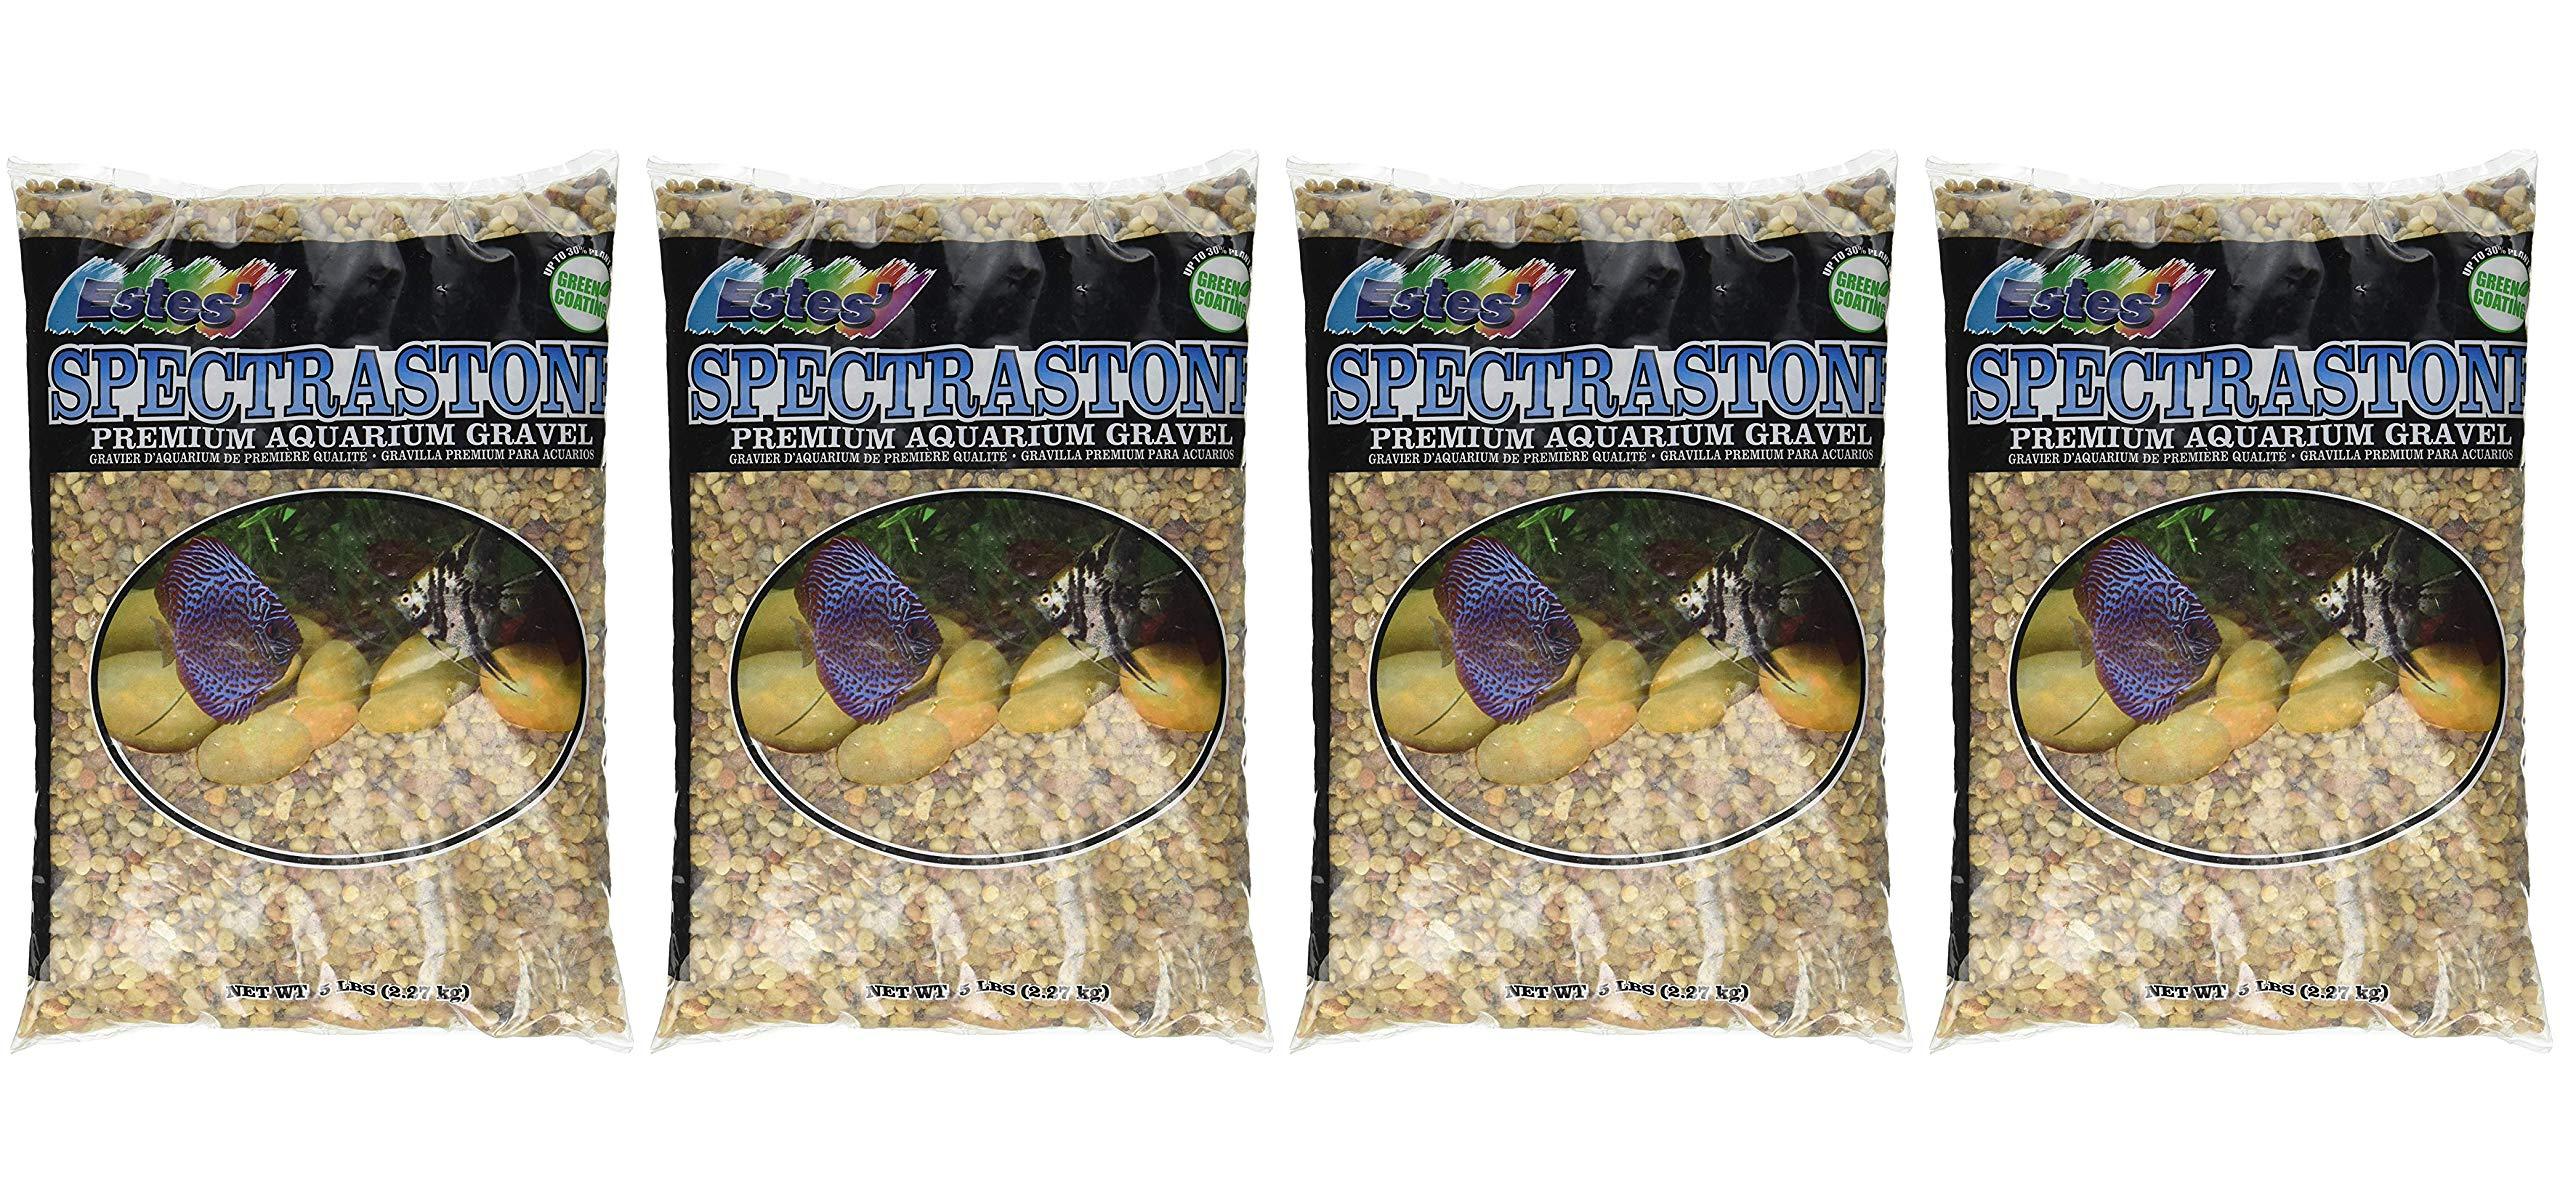 Spectrastone Shallow Creek Regular for Freshwater Aquariums, 5-Pound Bag (Fоur Paсk) by Spectrastone